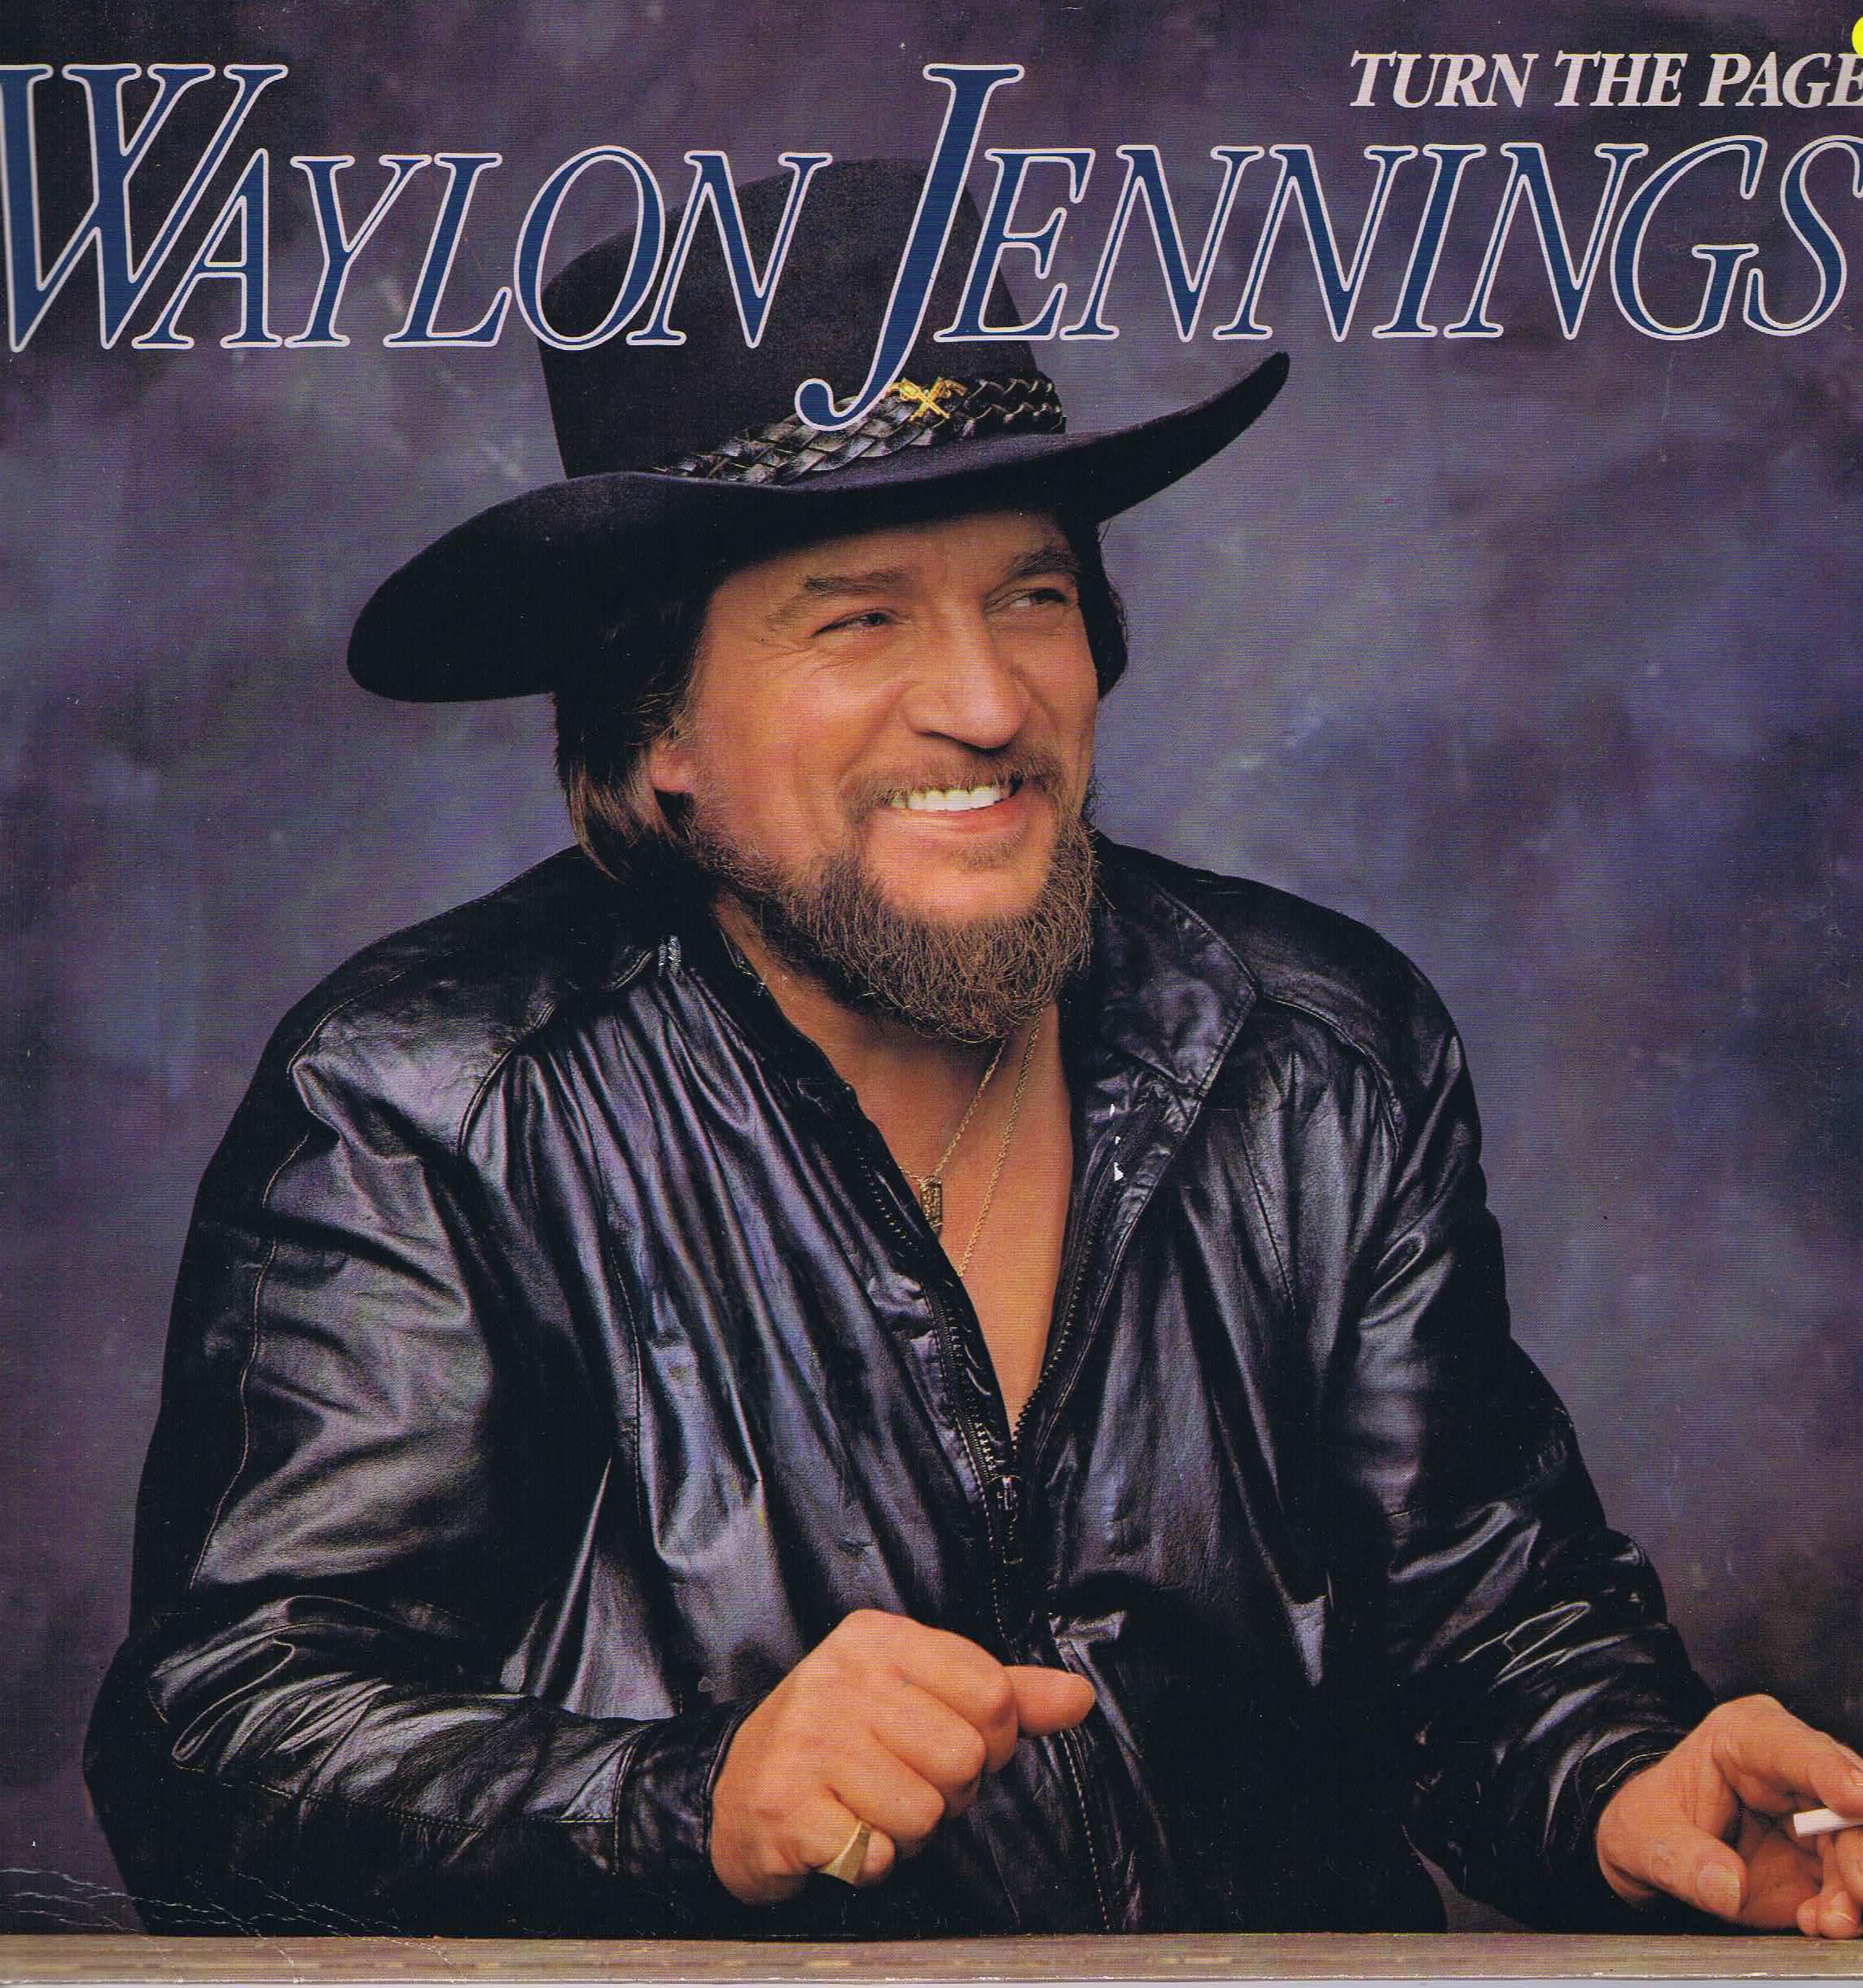 Waylon Jennings Turn The Page Pl 85 428 Lp Vinyl